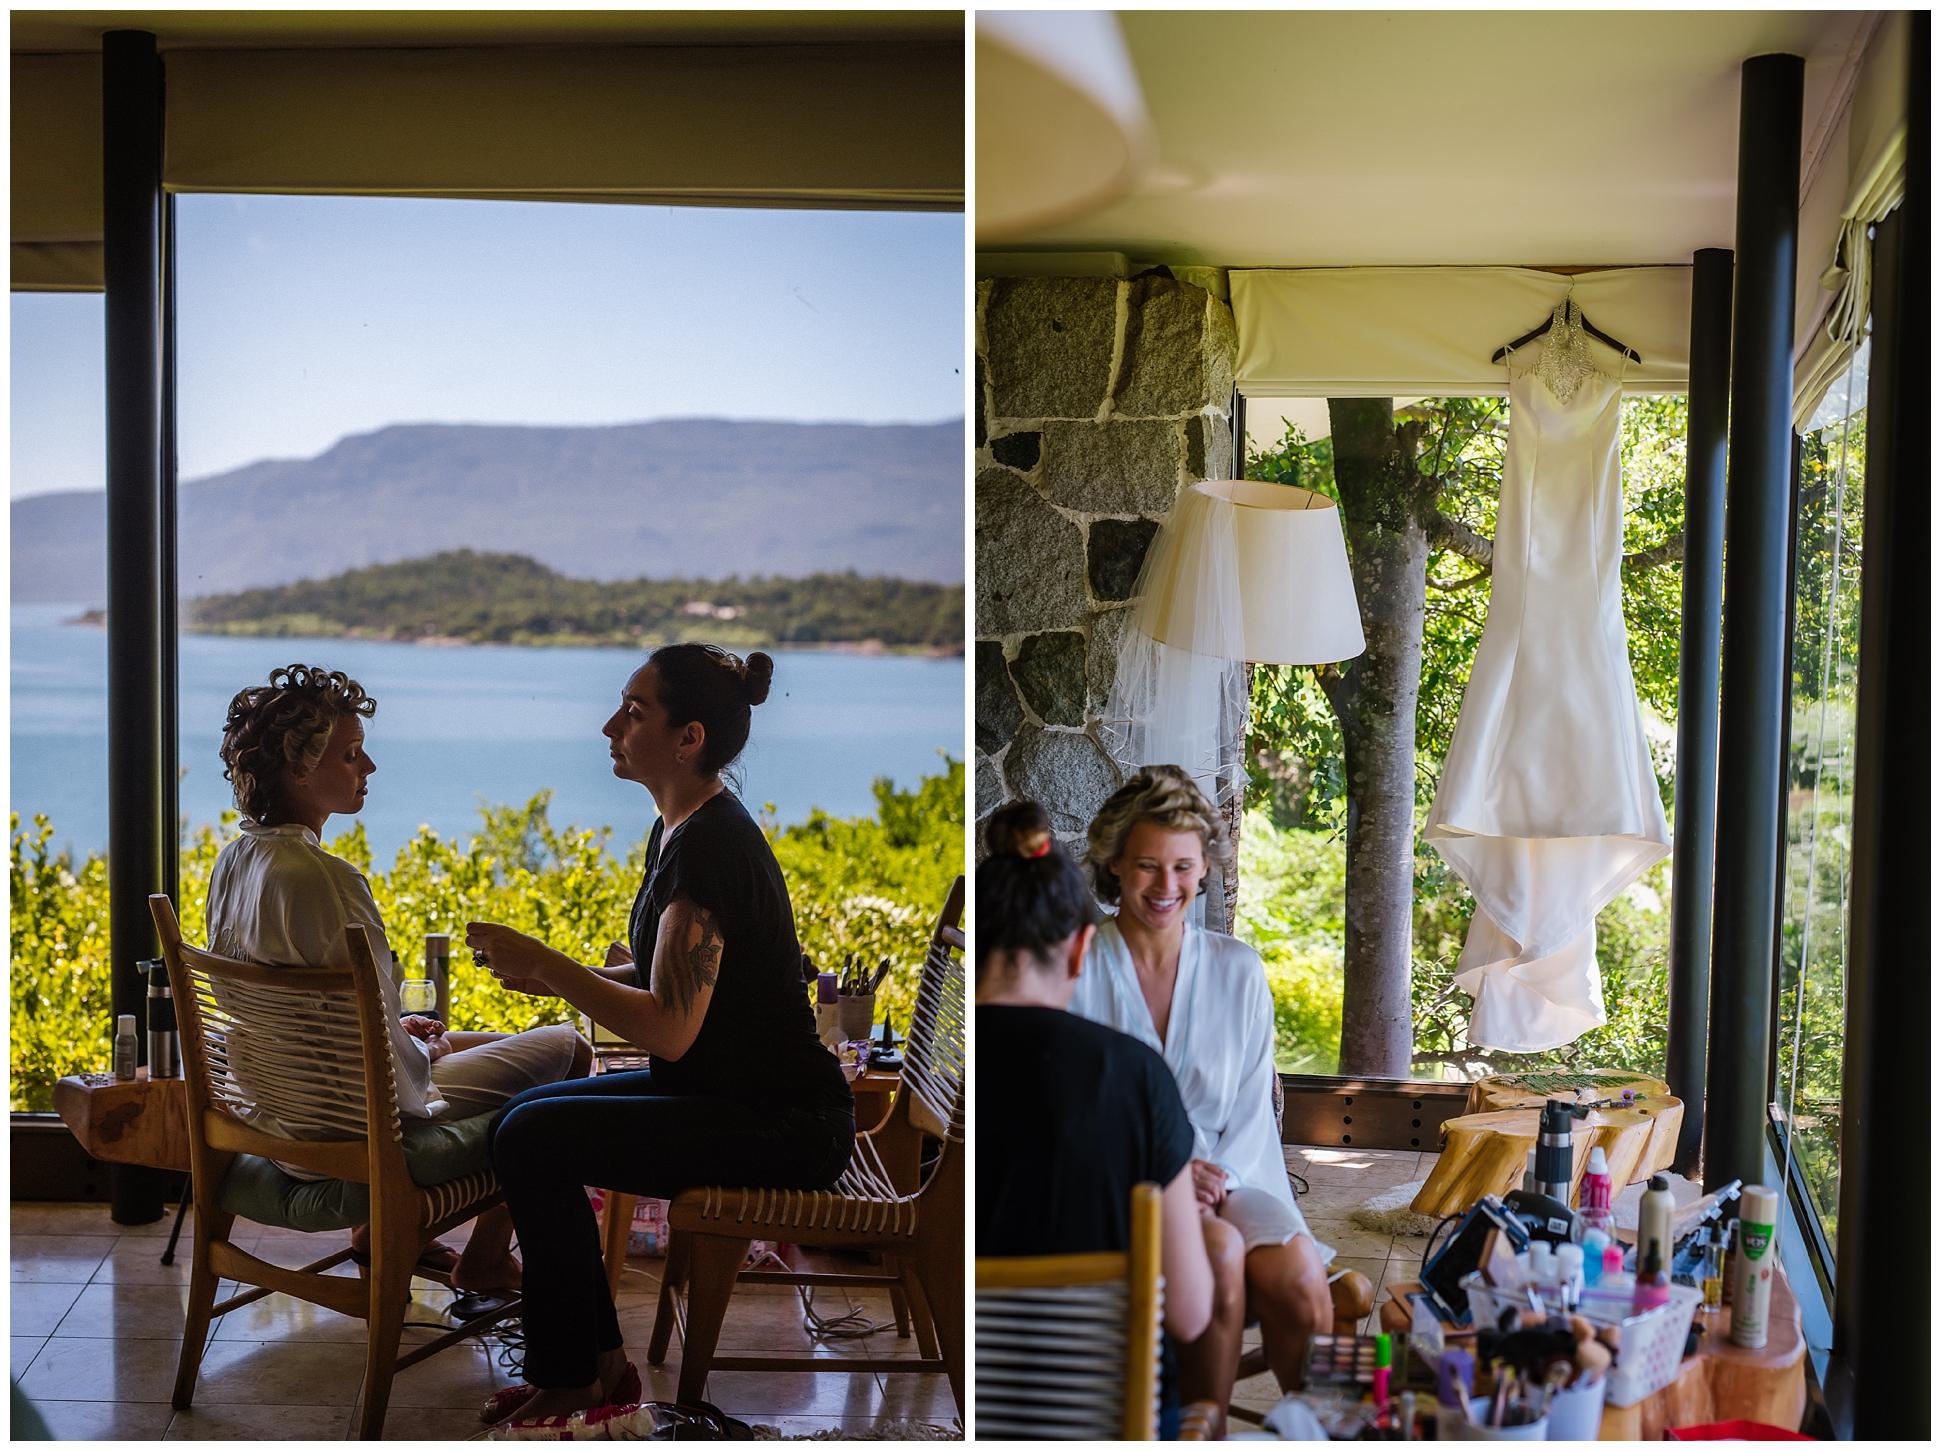 Cheilean-destination-adventure-wedding-florida-patagonia-pucon-santa-cruz-vsco_0060.jpg